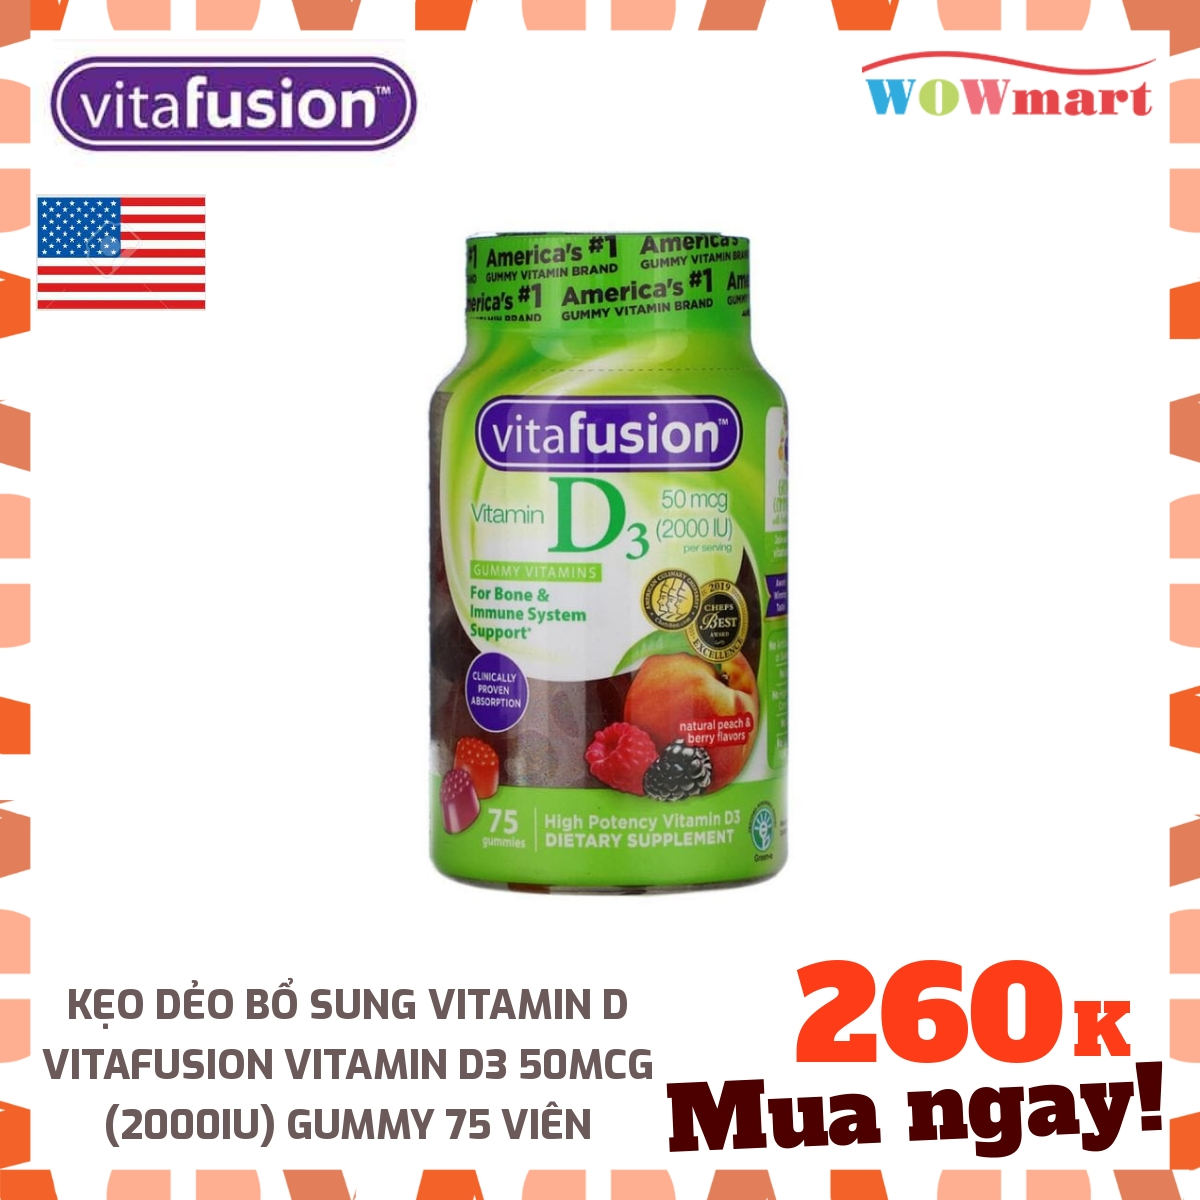 Kẹo dẻo bổ sung Vitamin D Vitafusion Vitamin D3 50mcg (2000IU) Gummy 75 viên - [MỸ]